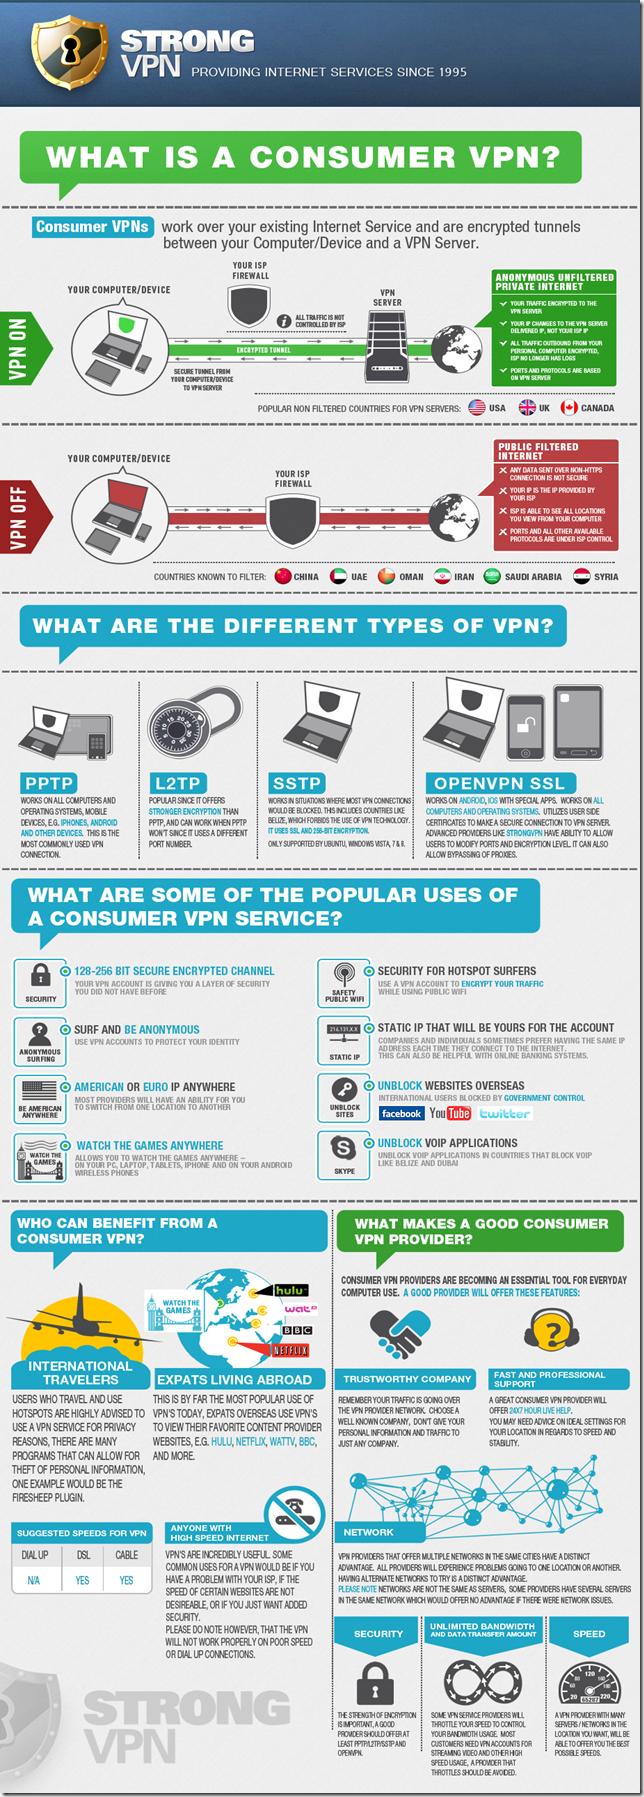 VPNs Explained